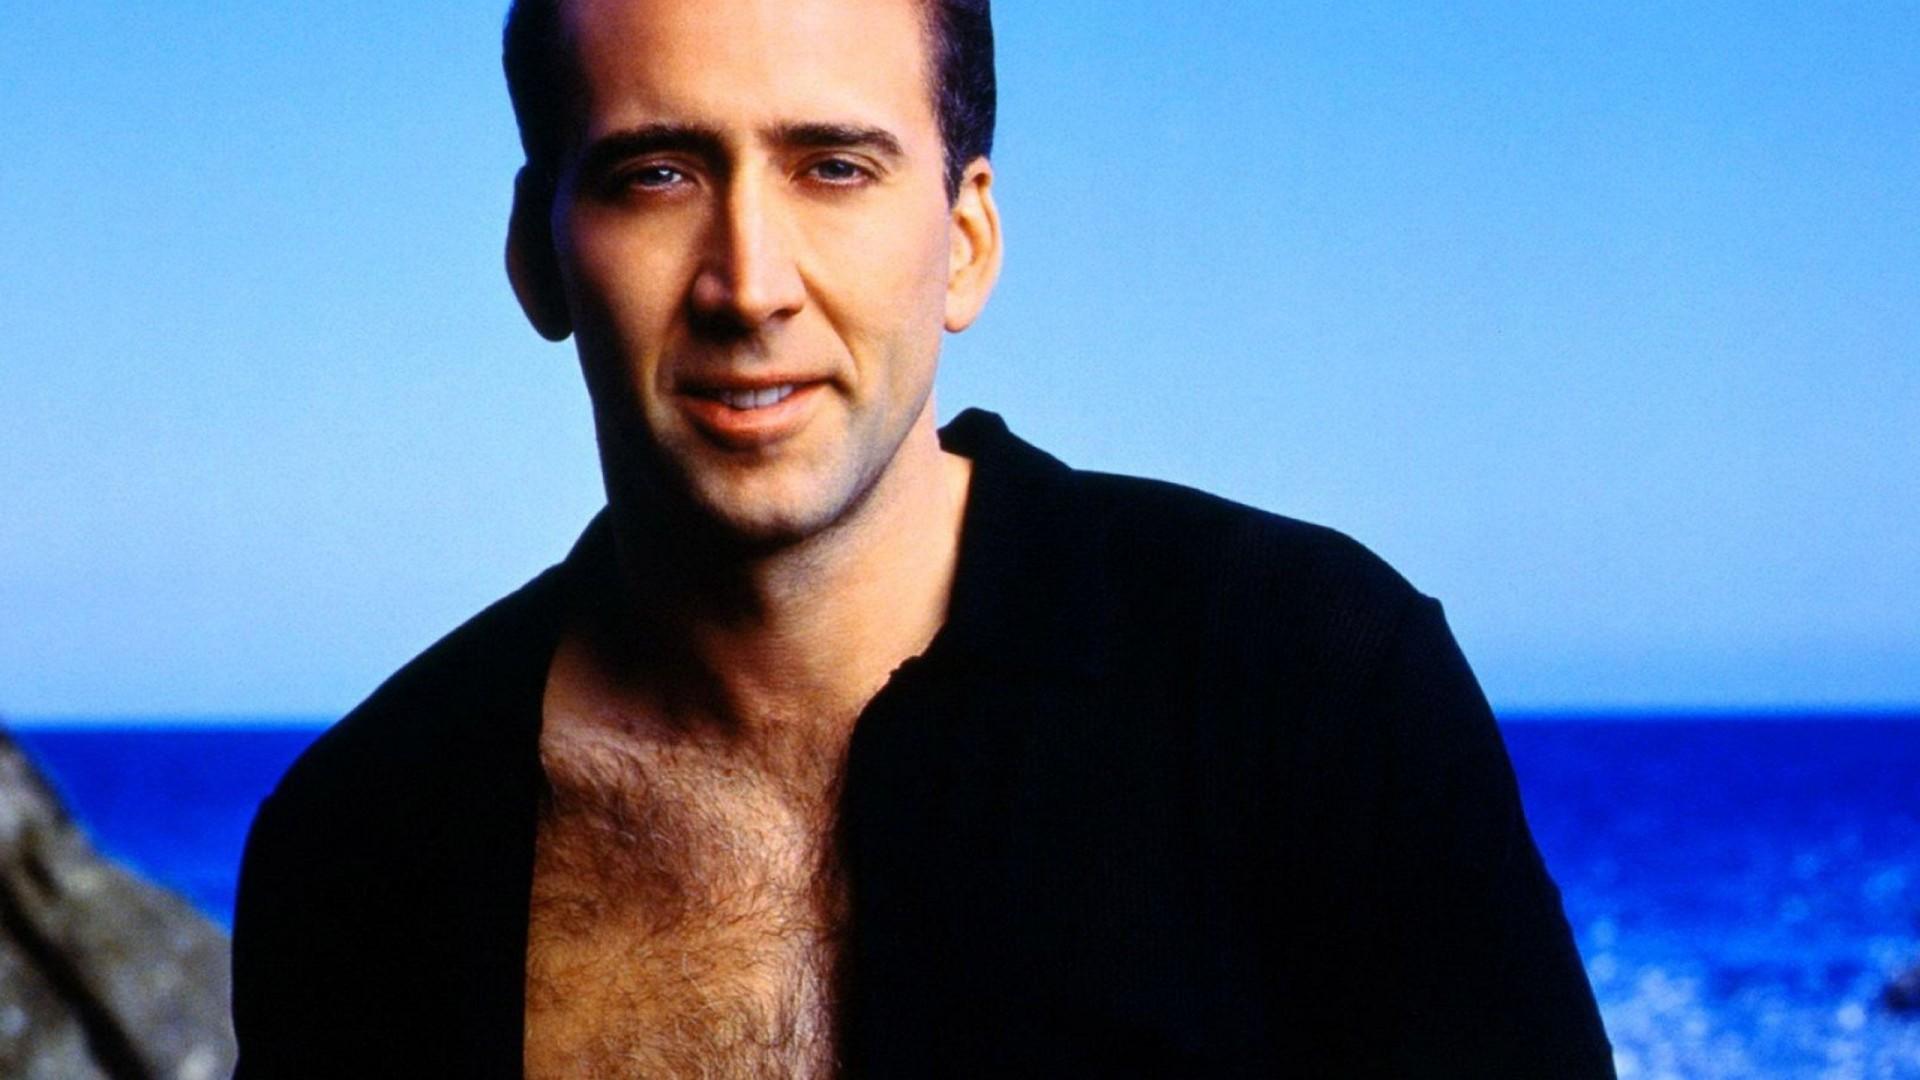 33] Nicolas Cage Wallpapers on WallpaperSafari 1920x1080